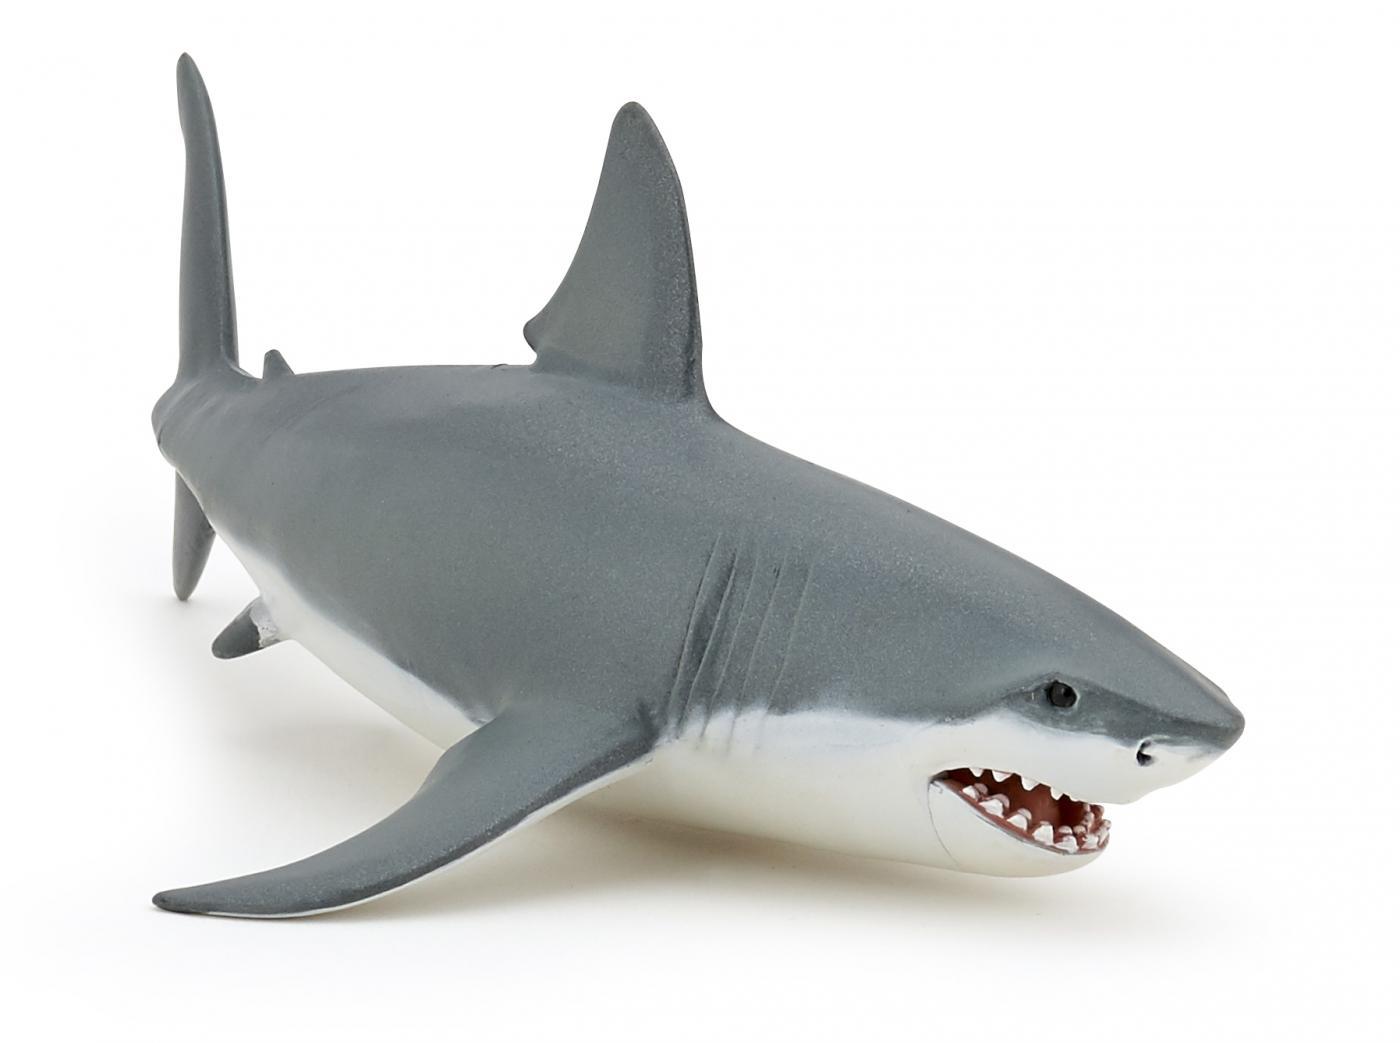 papo 56002 great white shark animal figures at spielzeug guenstig de